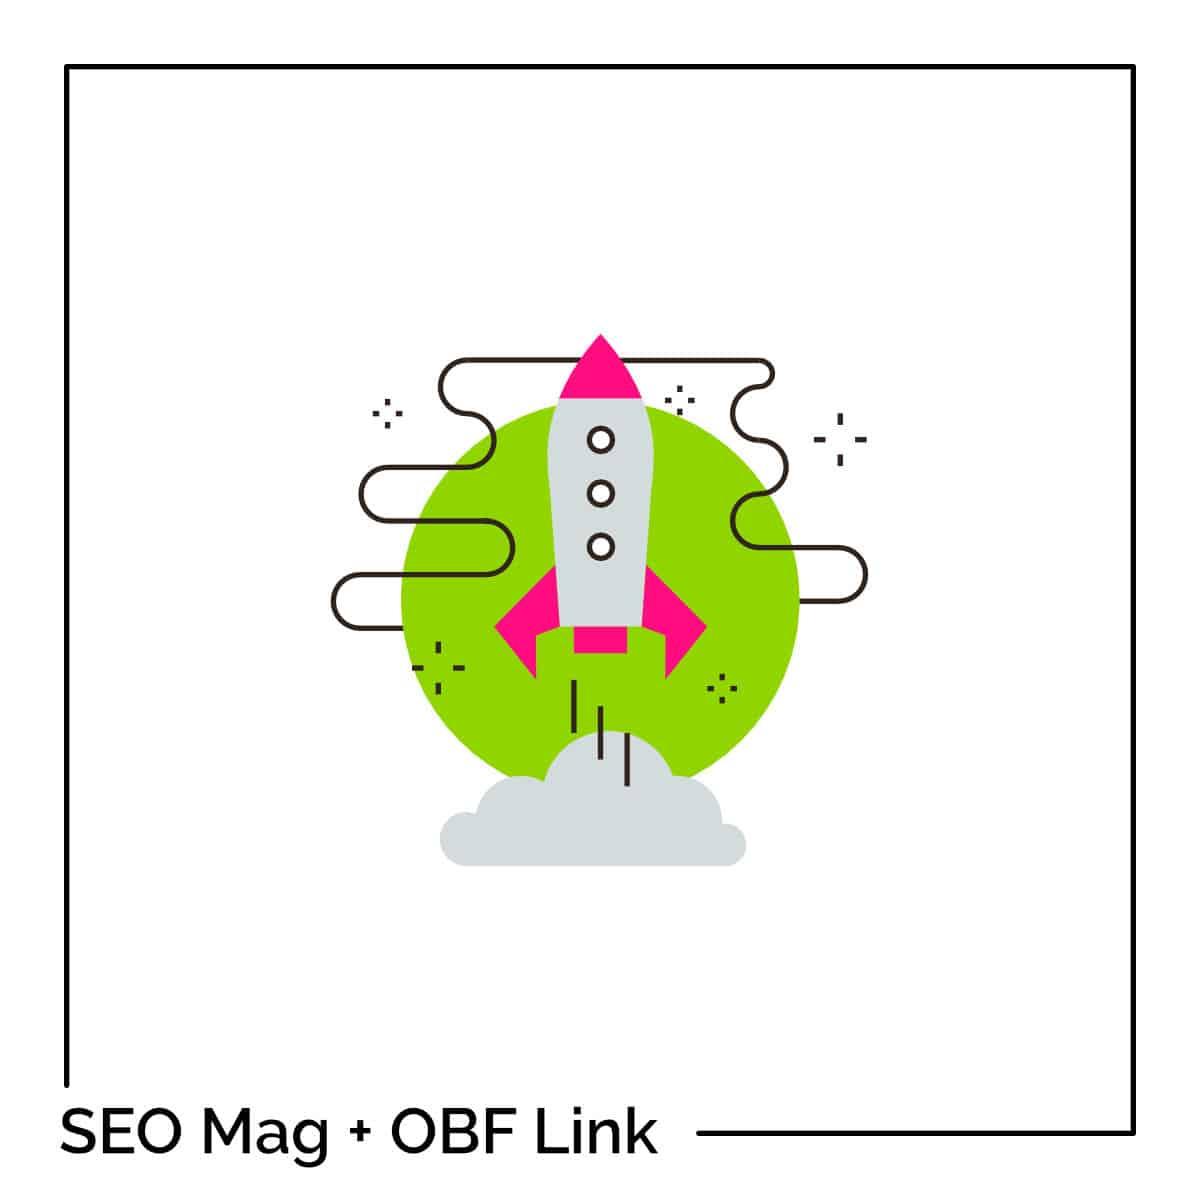 Seo Mag Obf Link